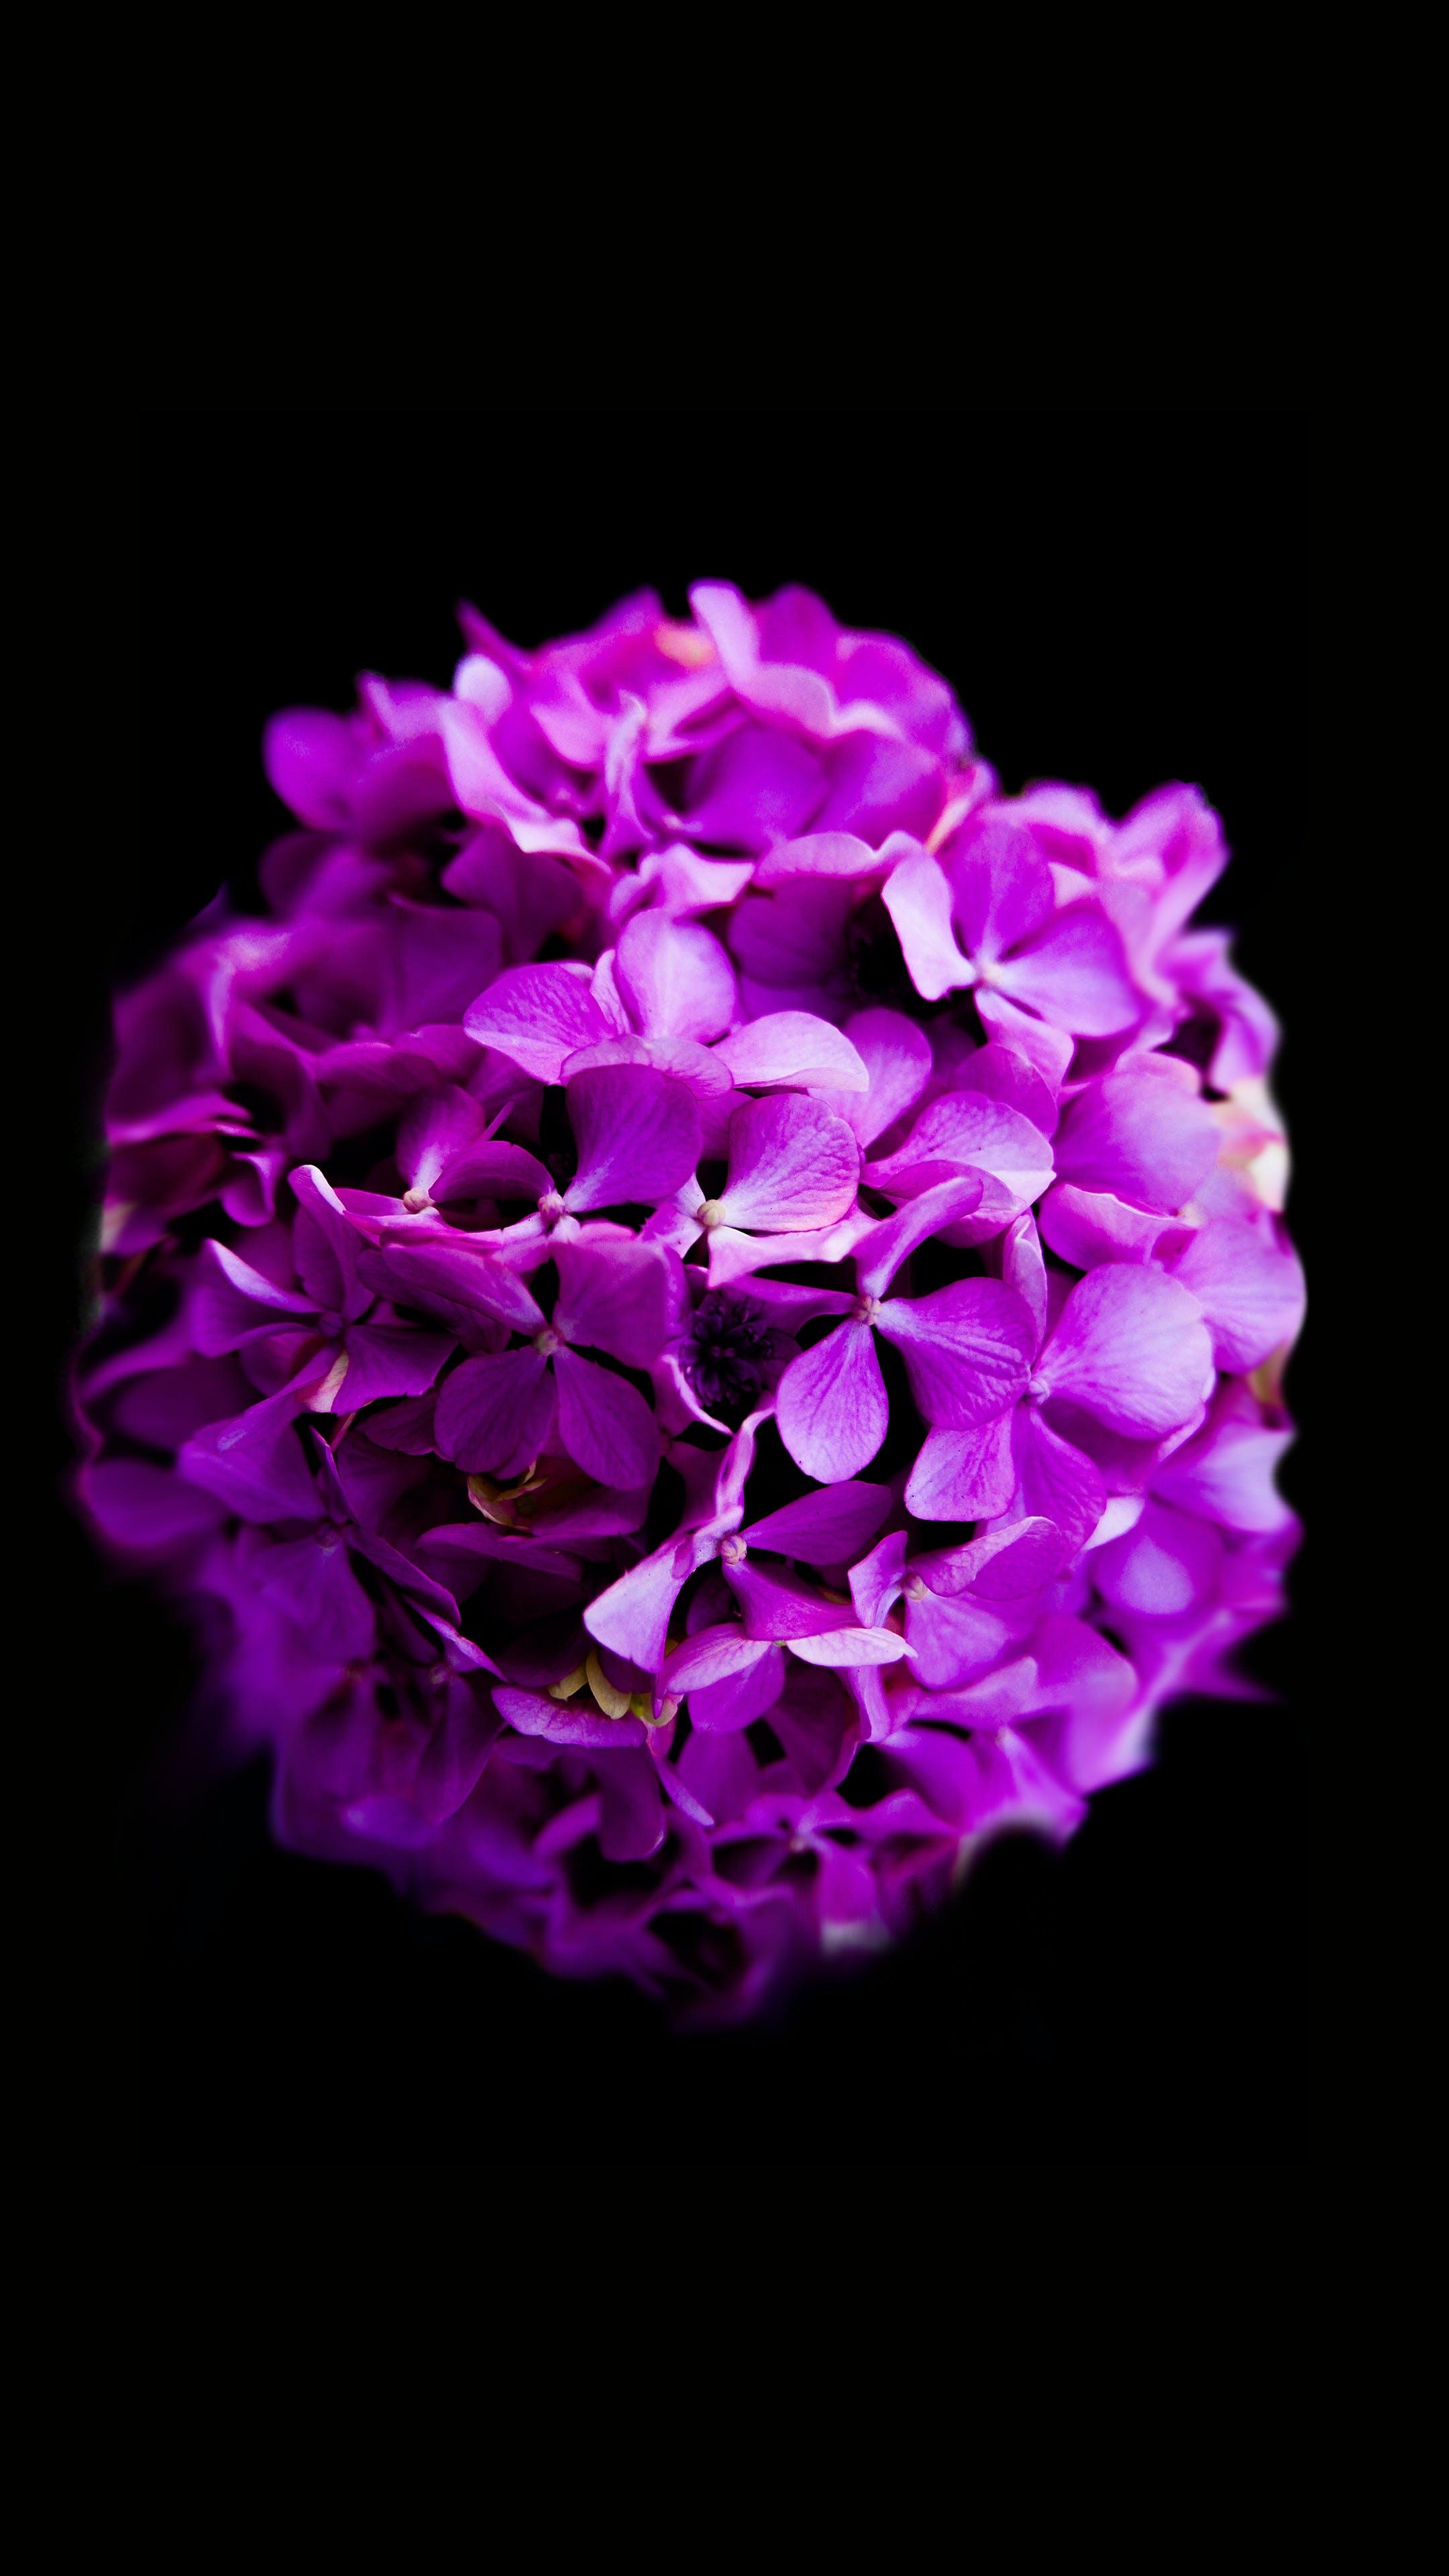 Kostenloses Stock Foto zu blumen, lila, blütenblätter, pflanze